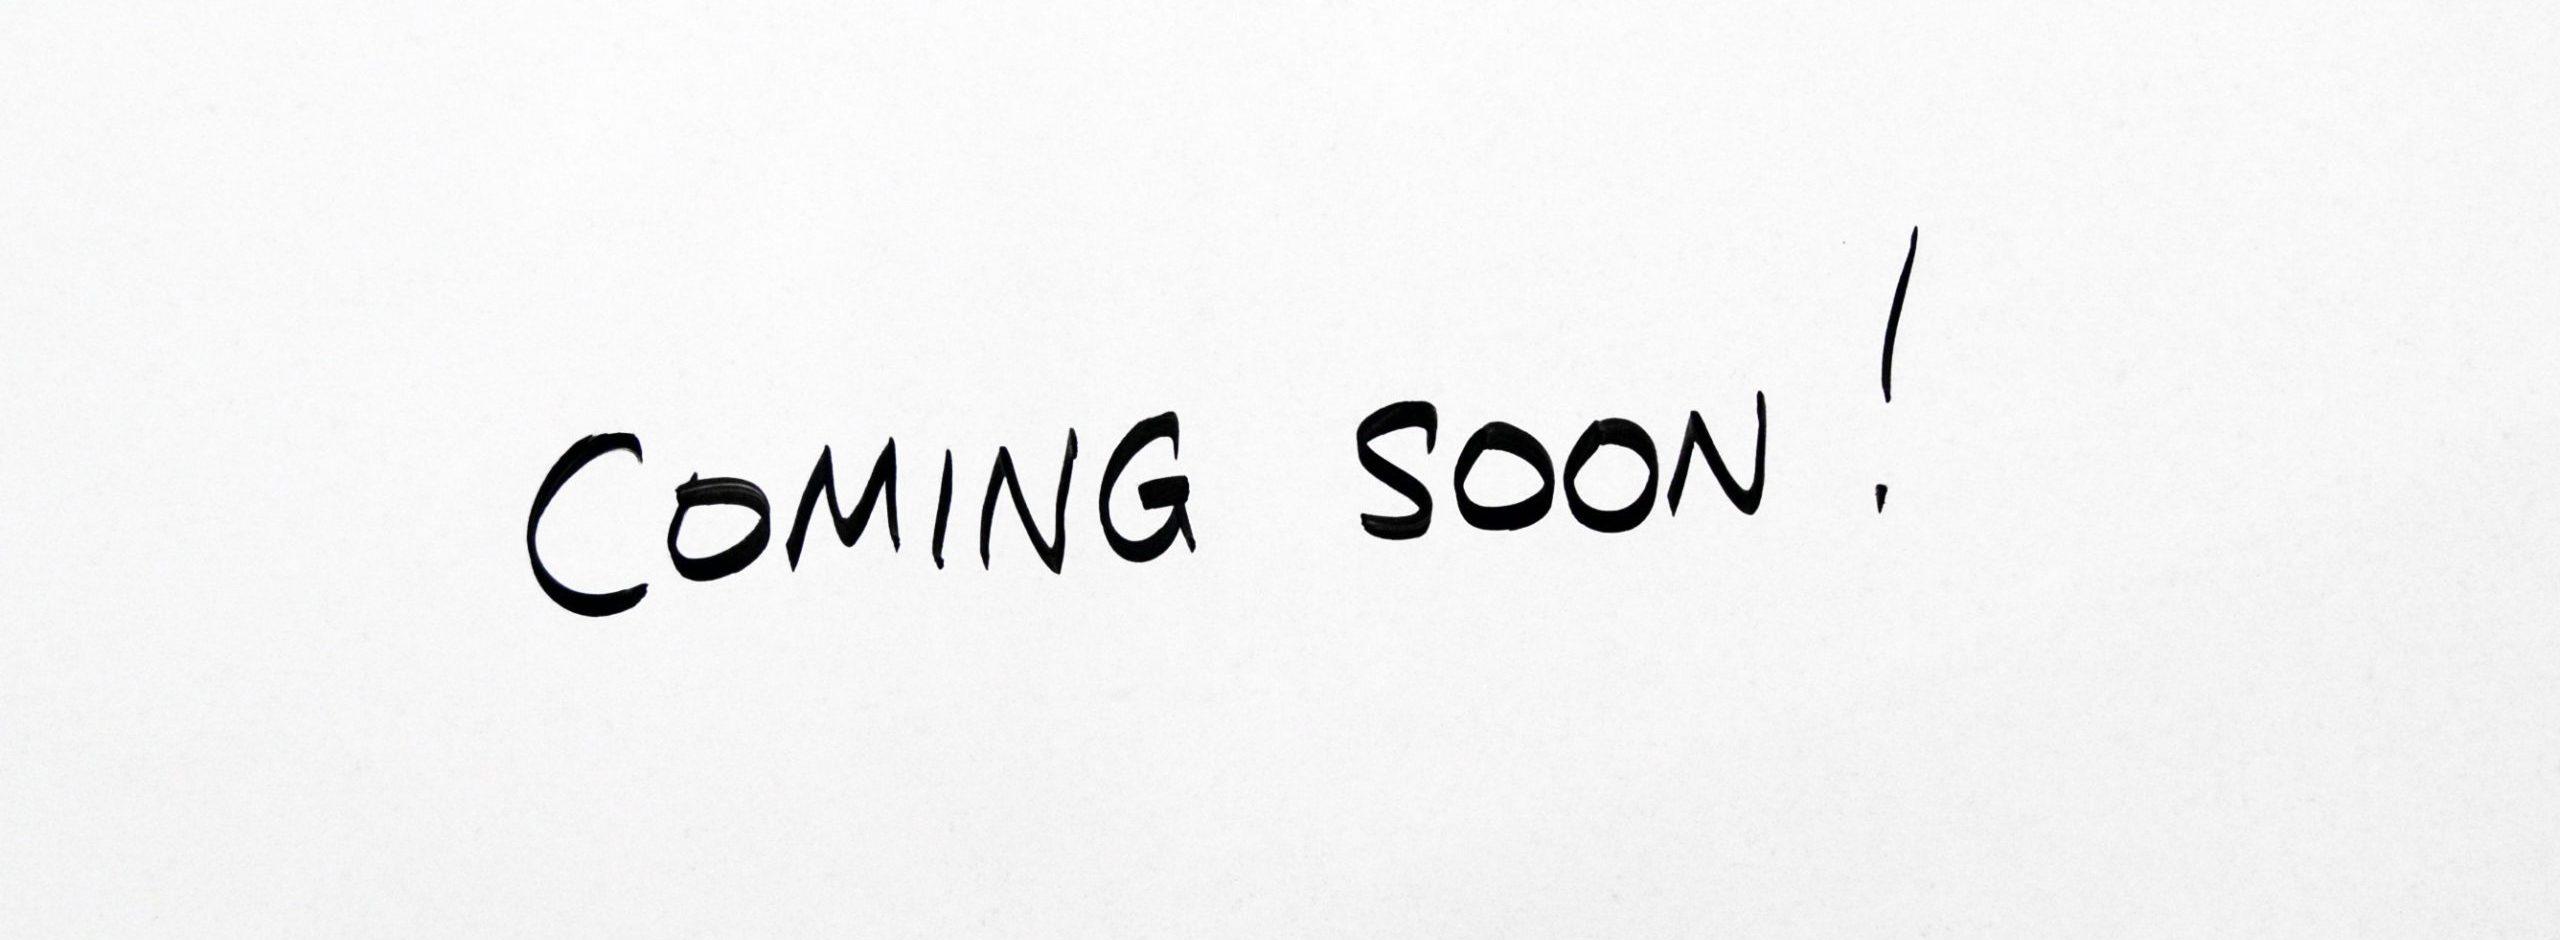 coming-soon-2579123